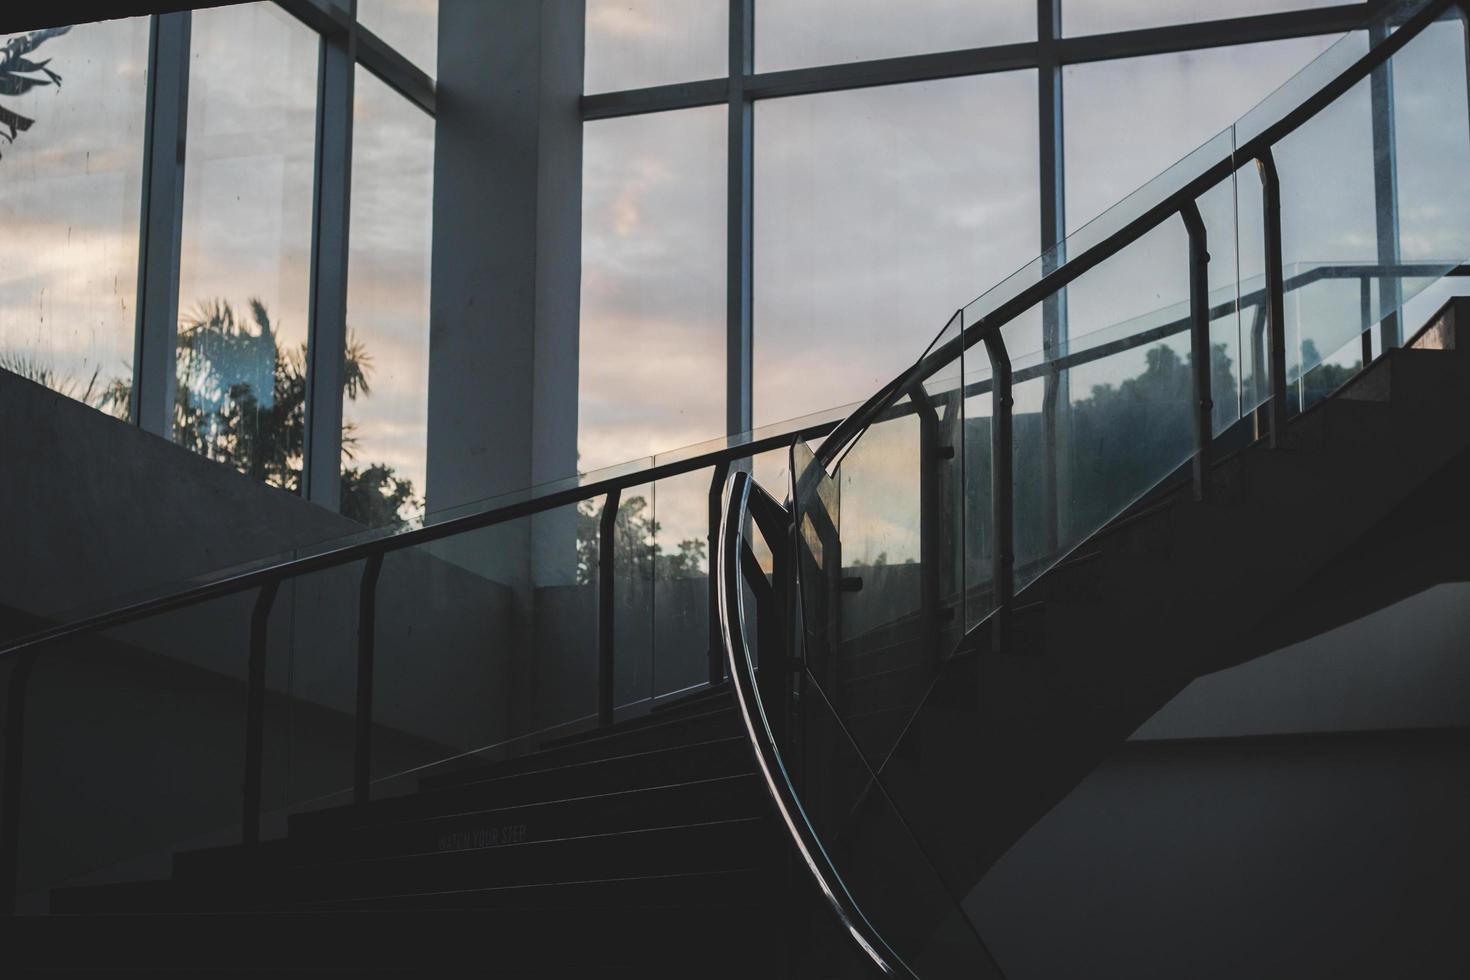 scala interna all'alba foto